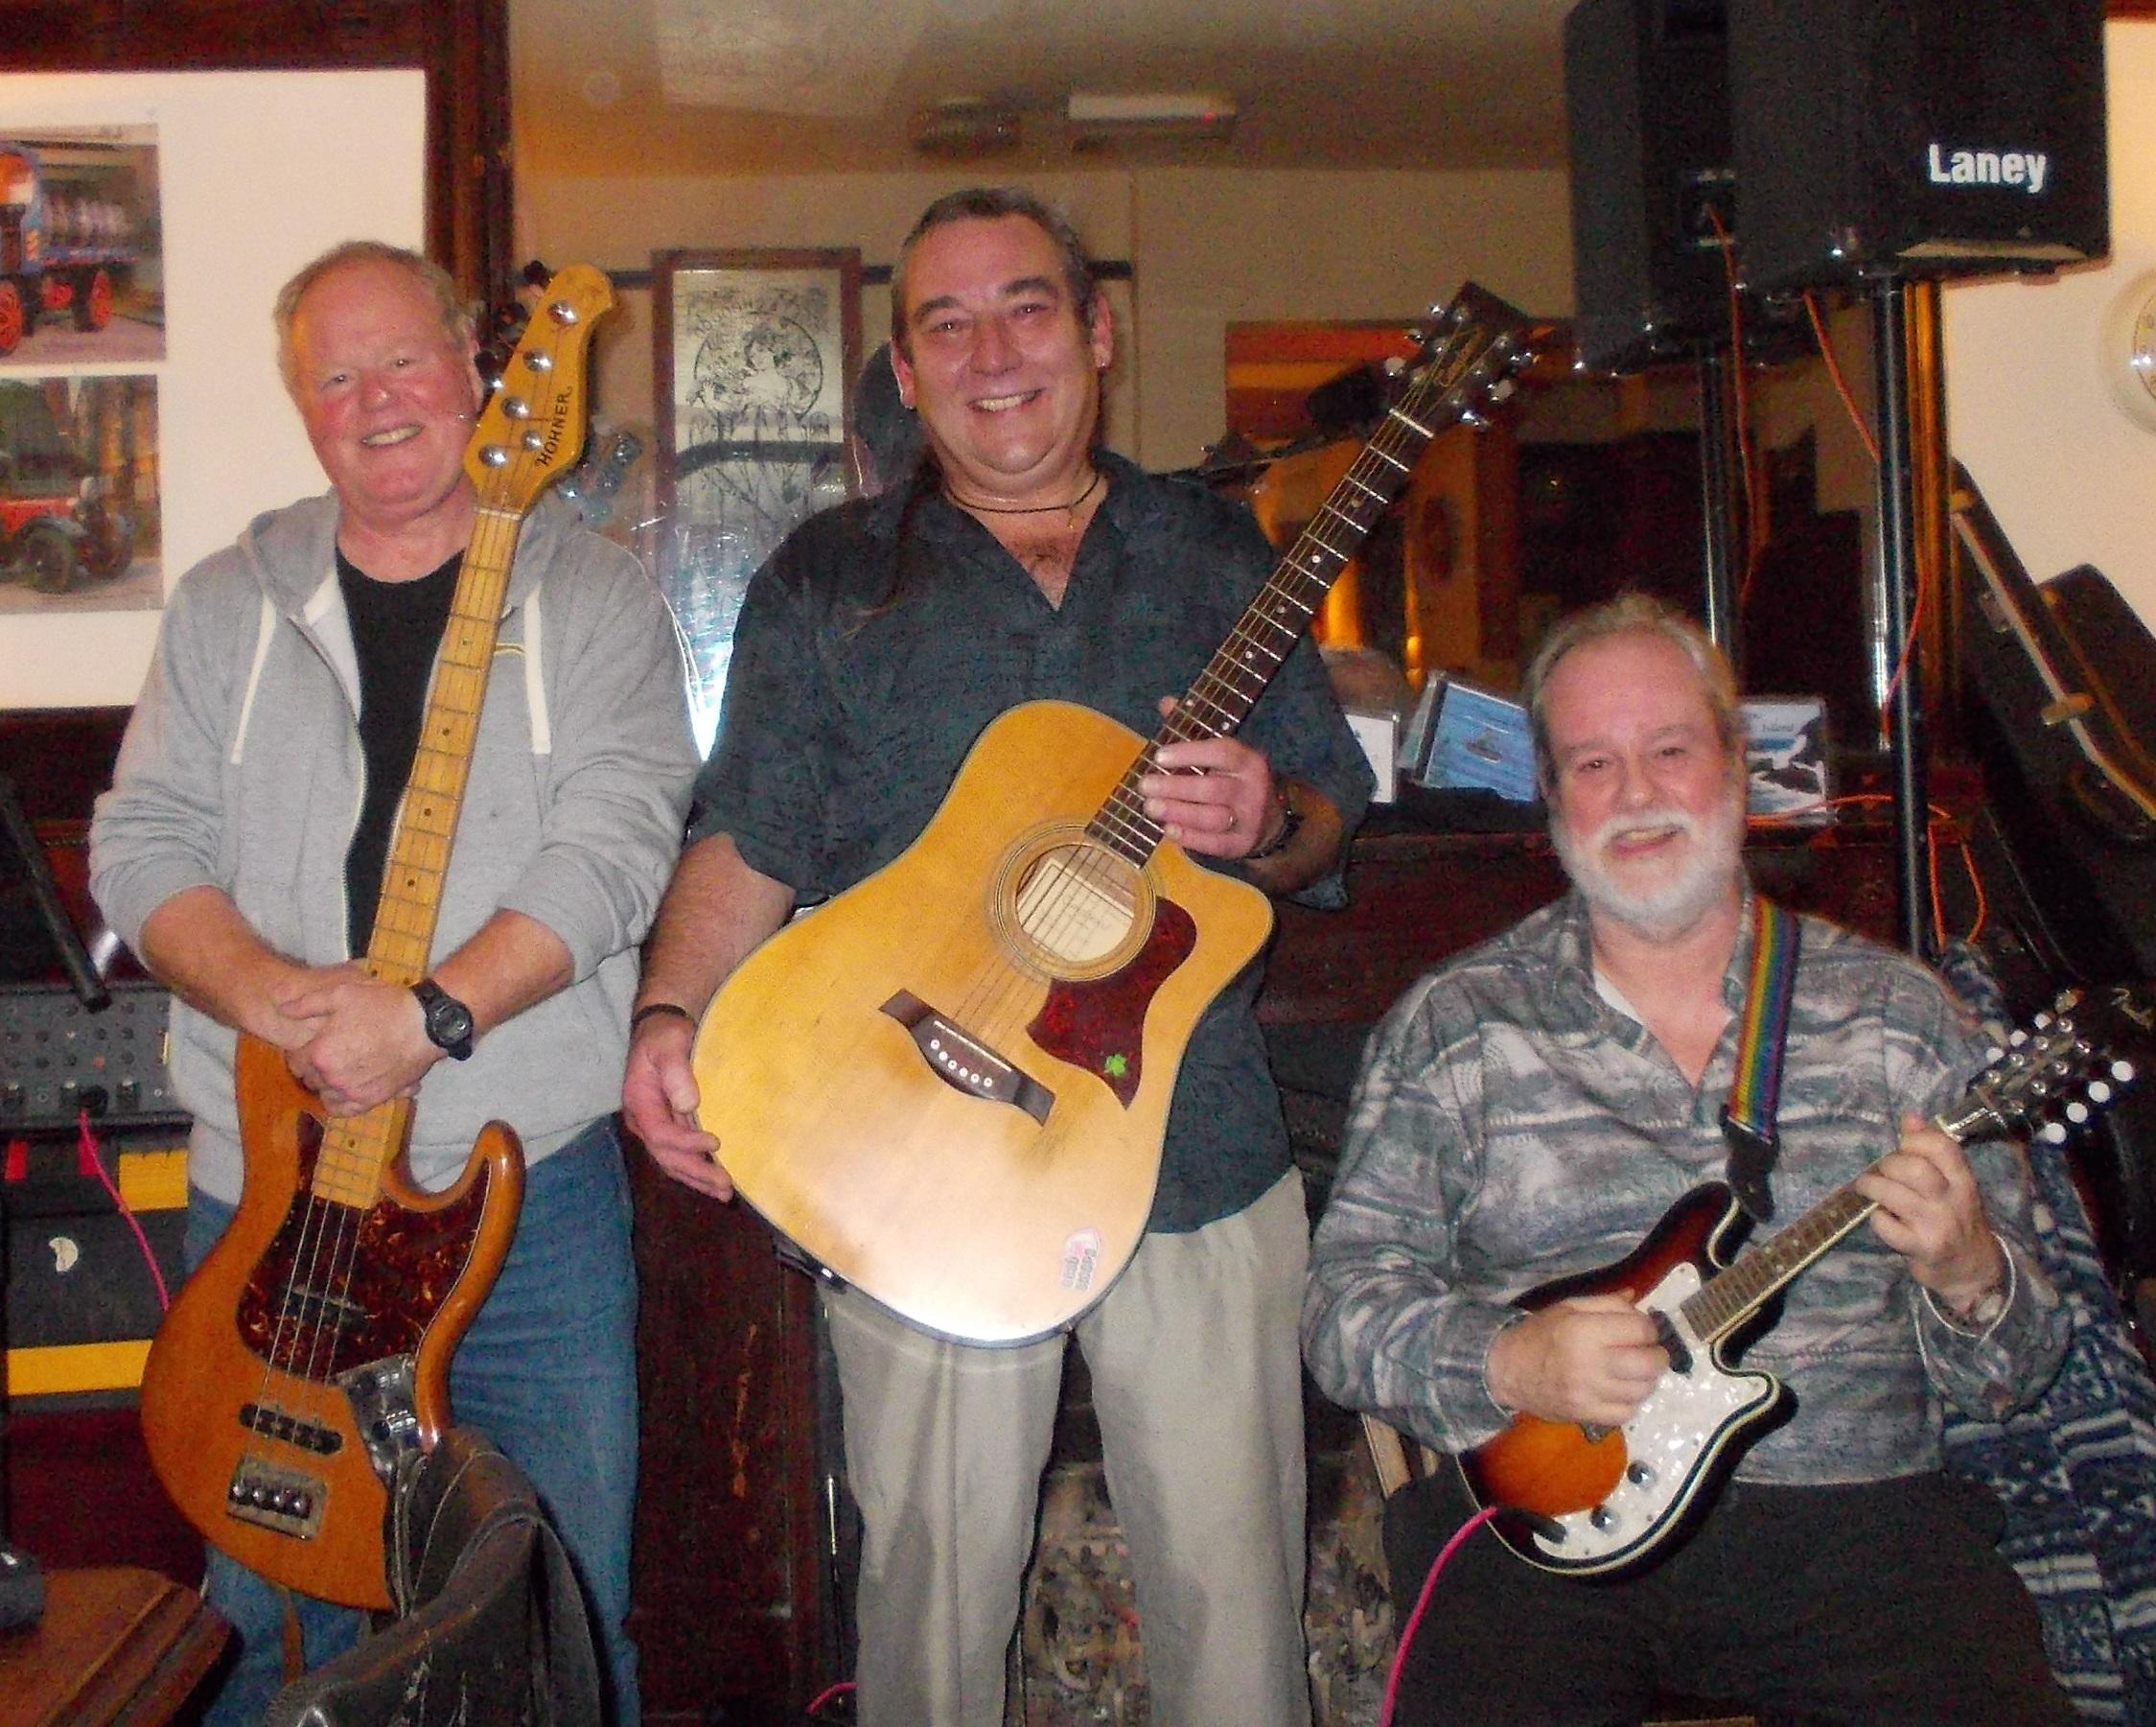 Ged Kelly & The Paddywackers - Irish Singer & Band